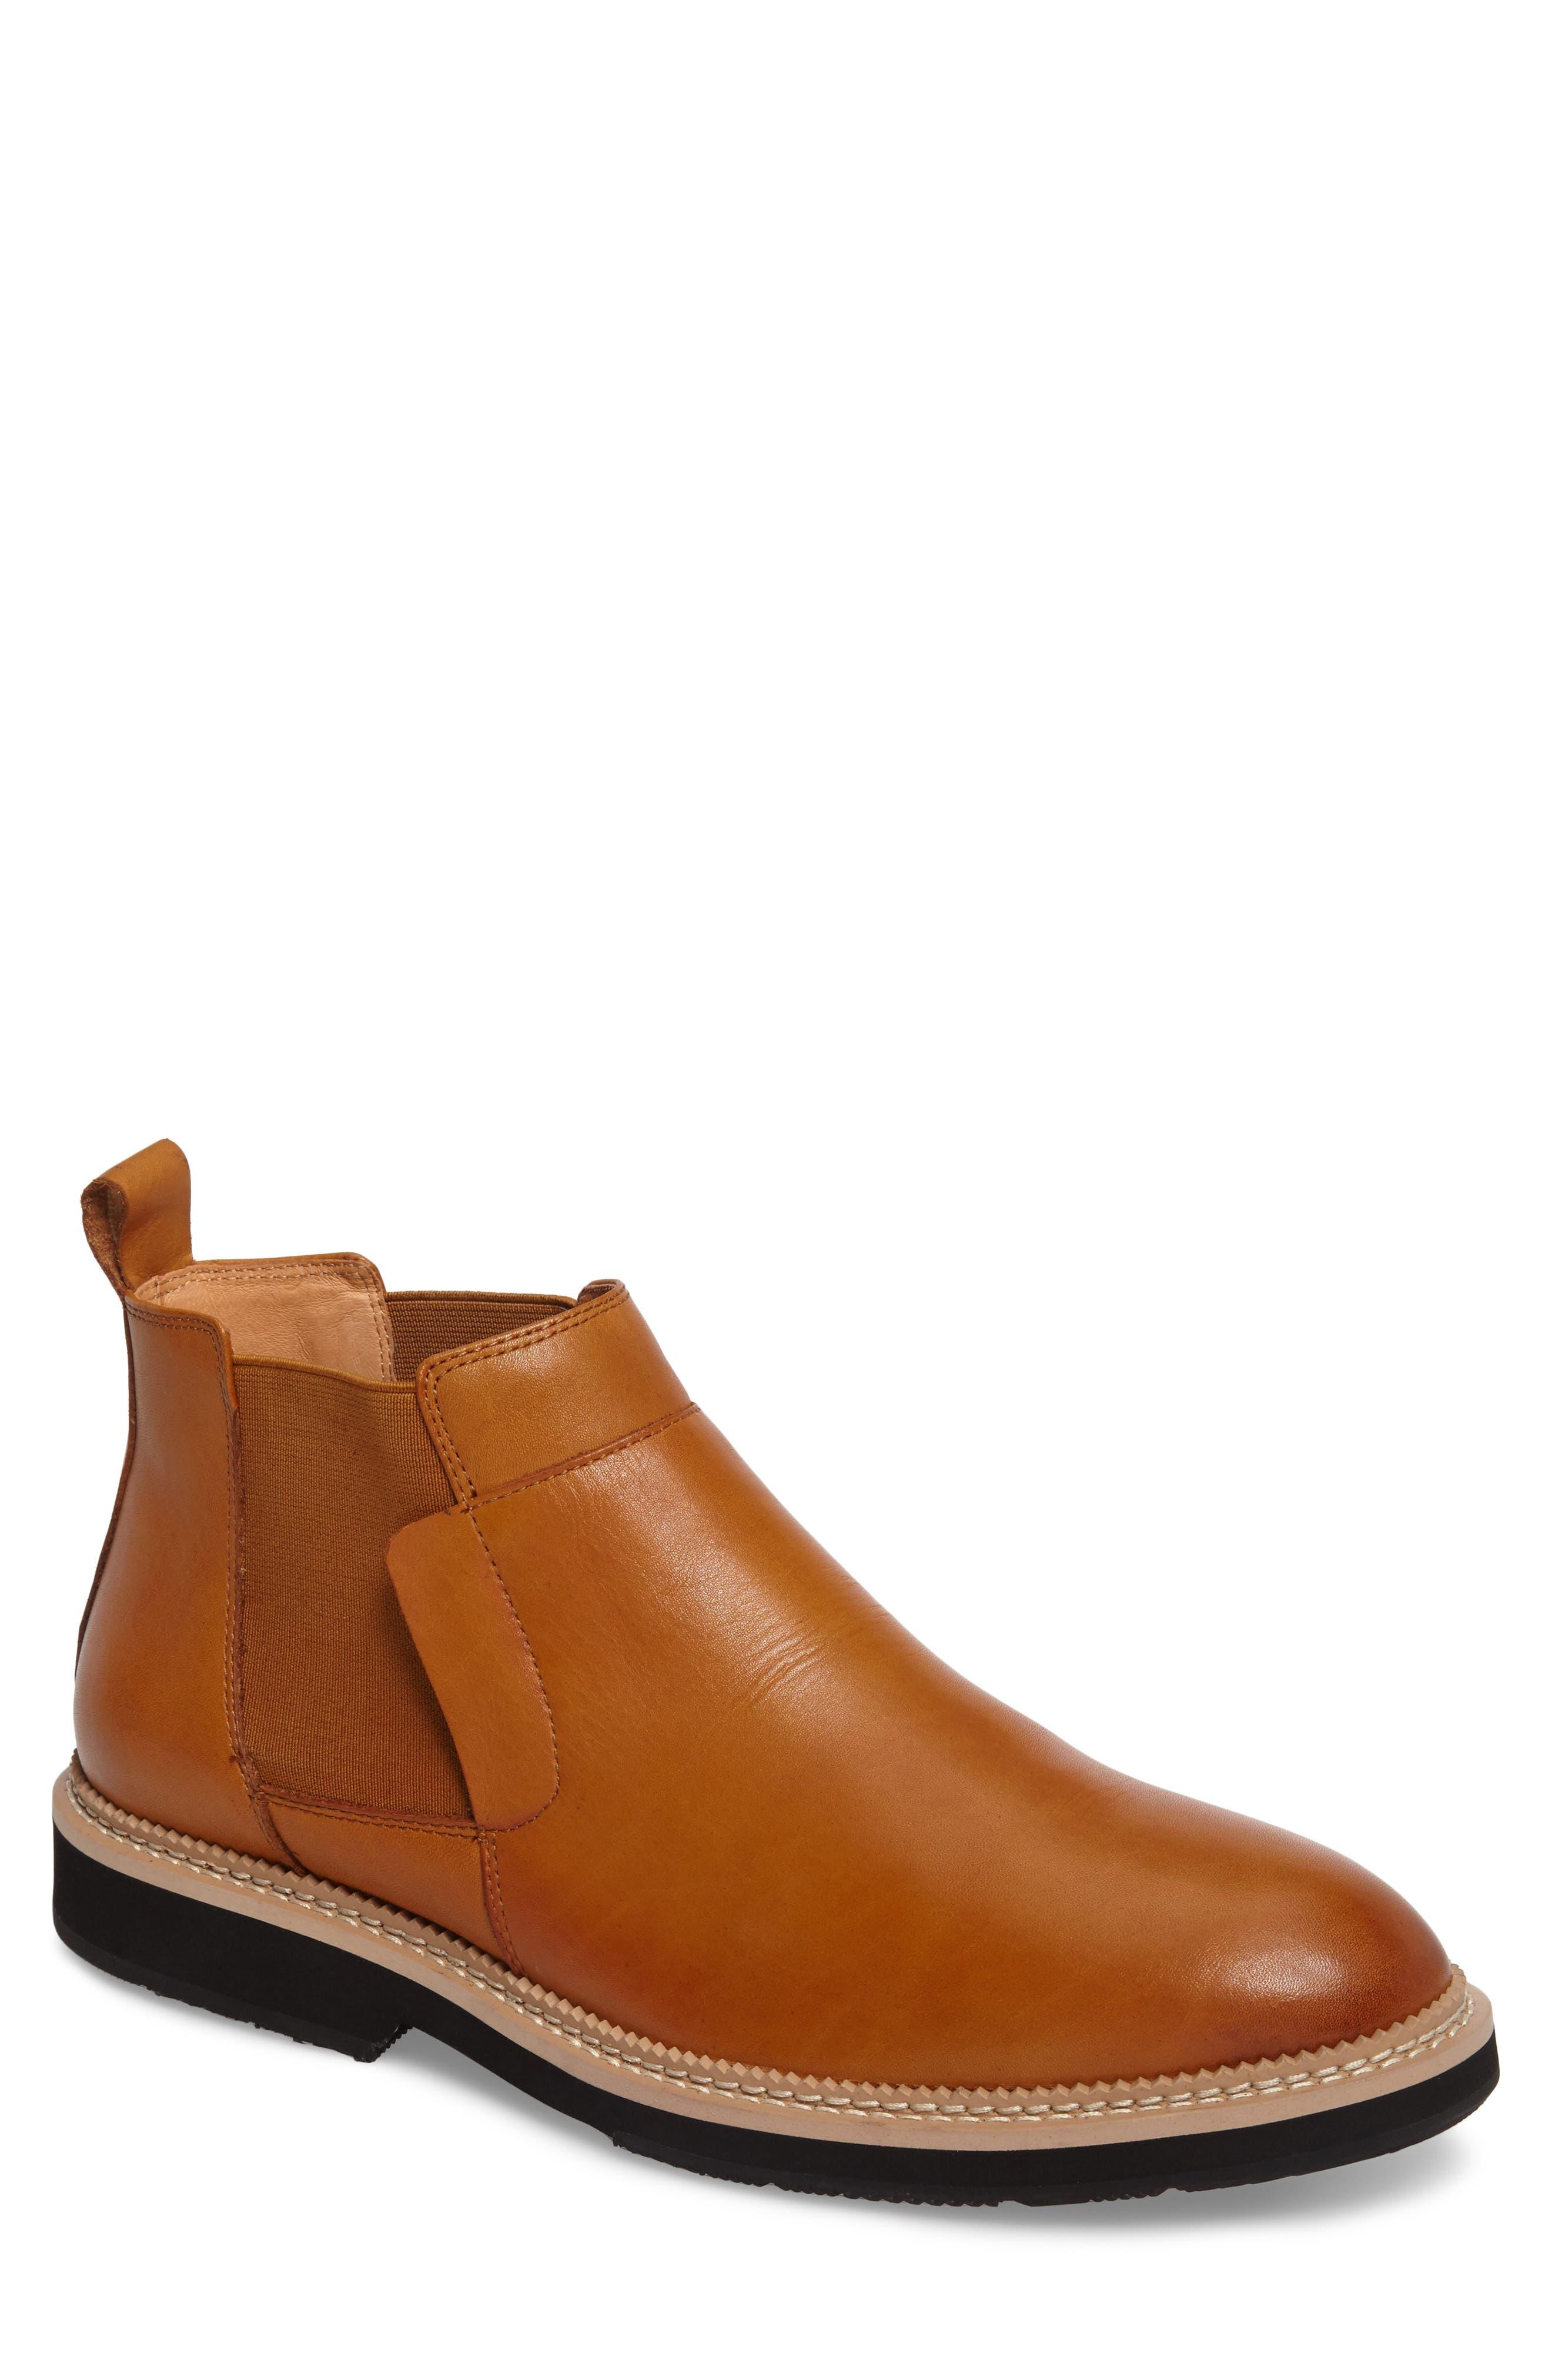 Garrad Chelsea Boot,                         Main,                         color, Cognac Leather